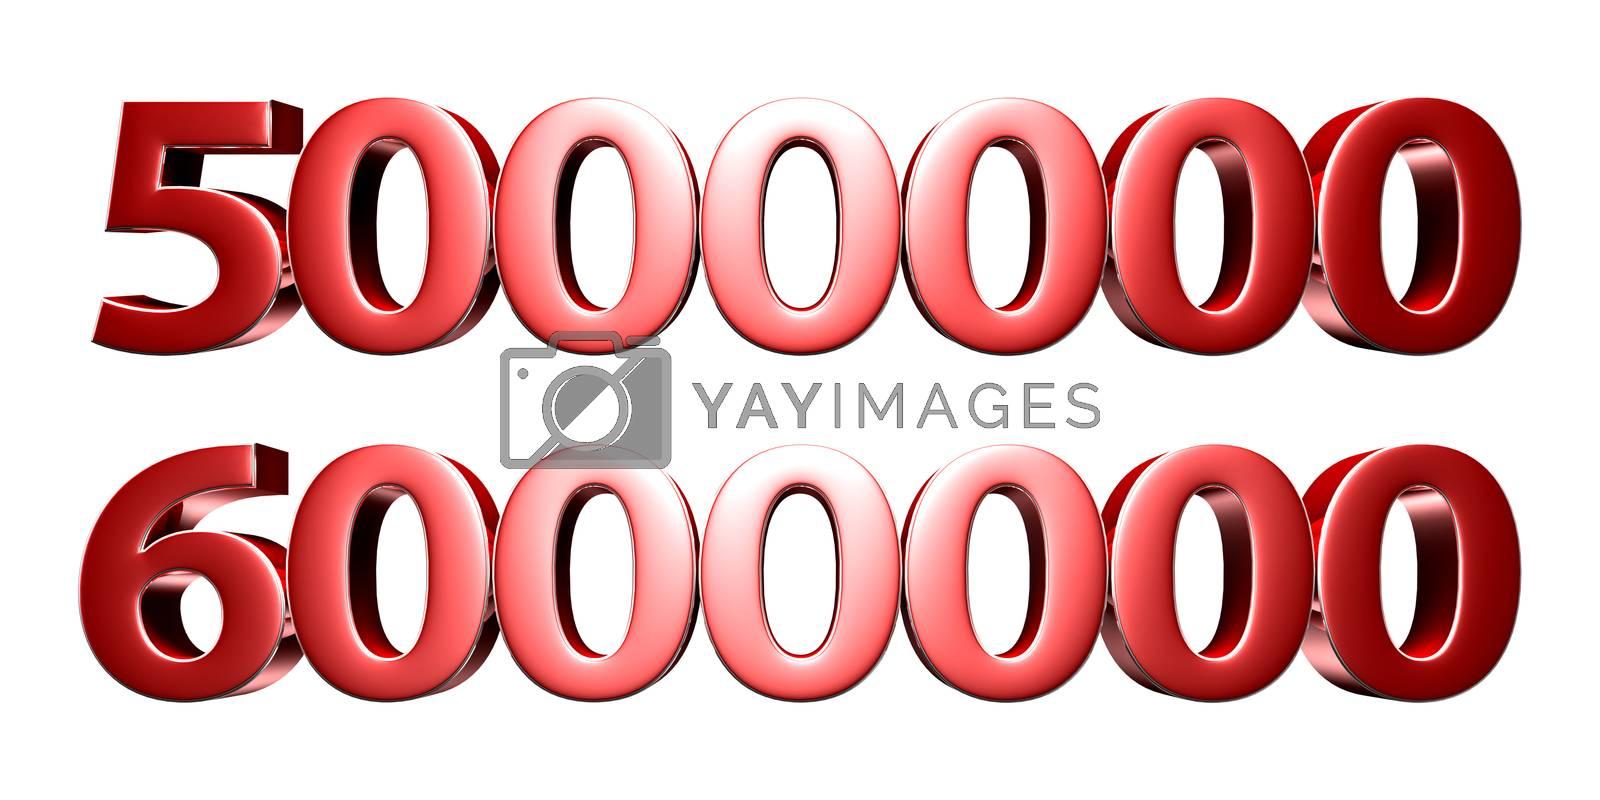 5 million and 6 million 3d. by thitimontoyai